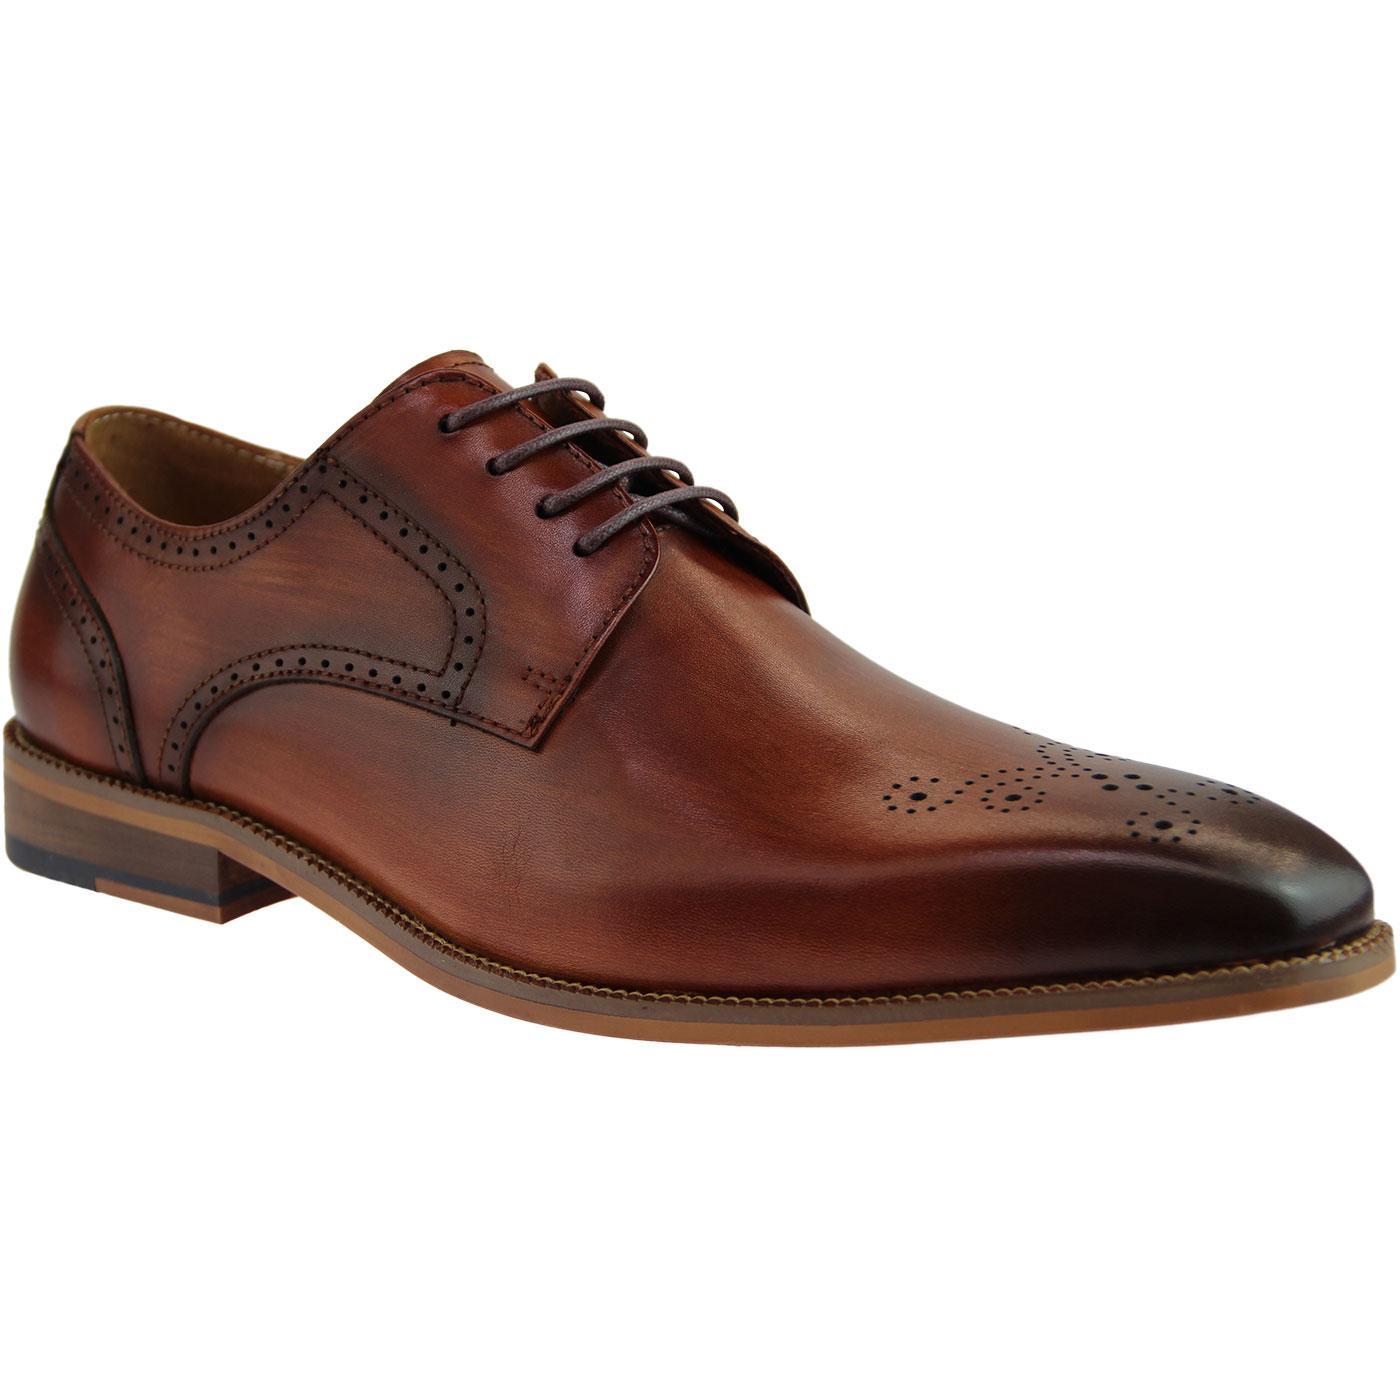 Leroy SERGIO DULETTI Mod Derby Brogue Shoes BROWN